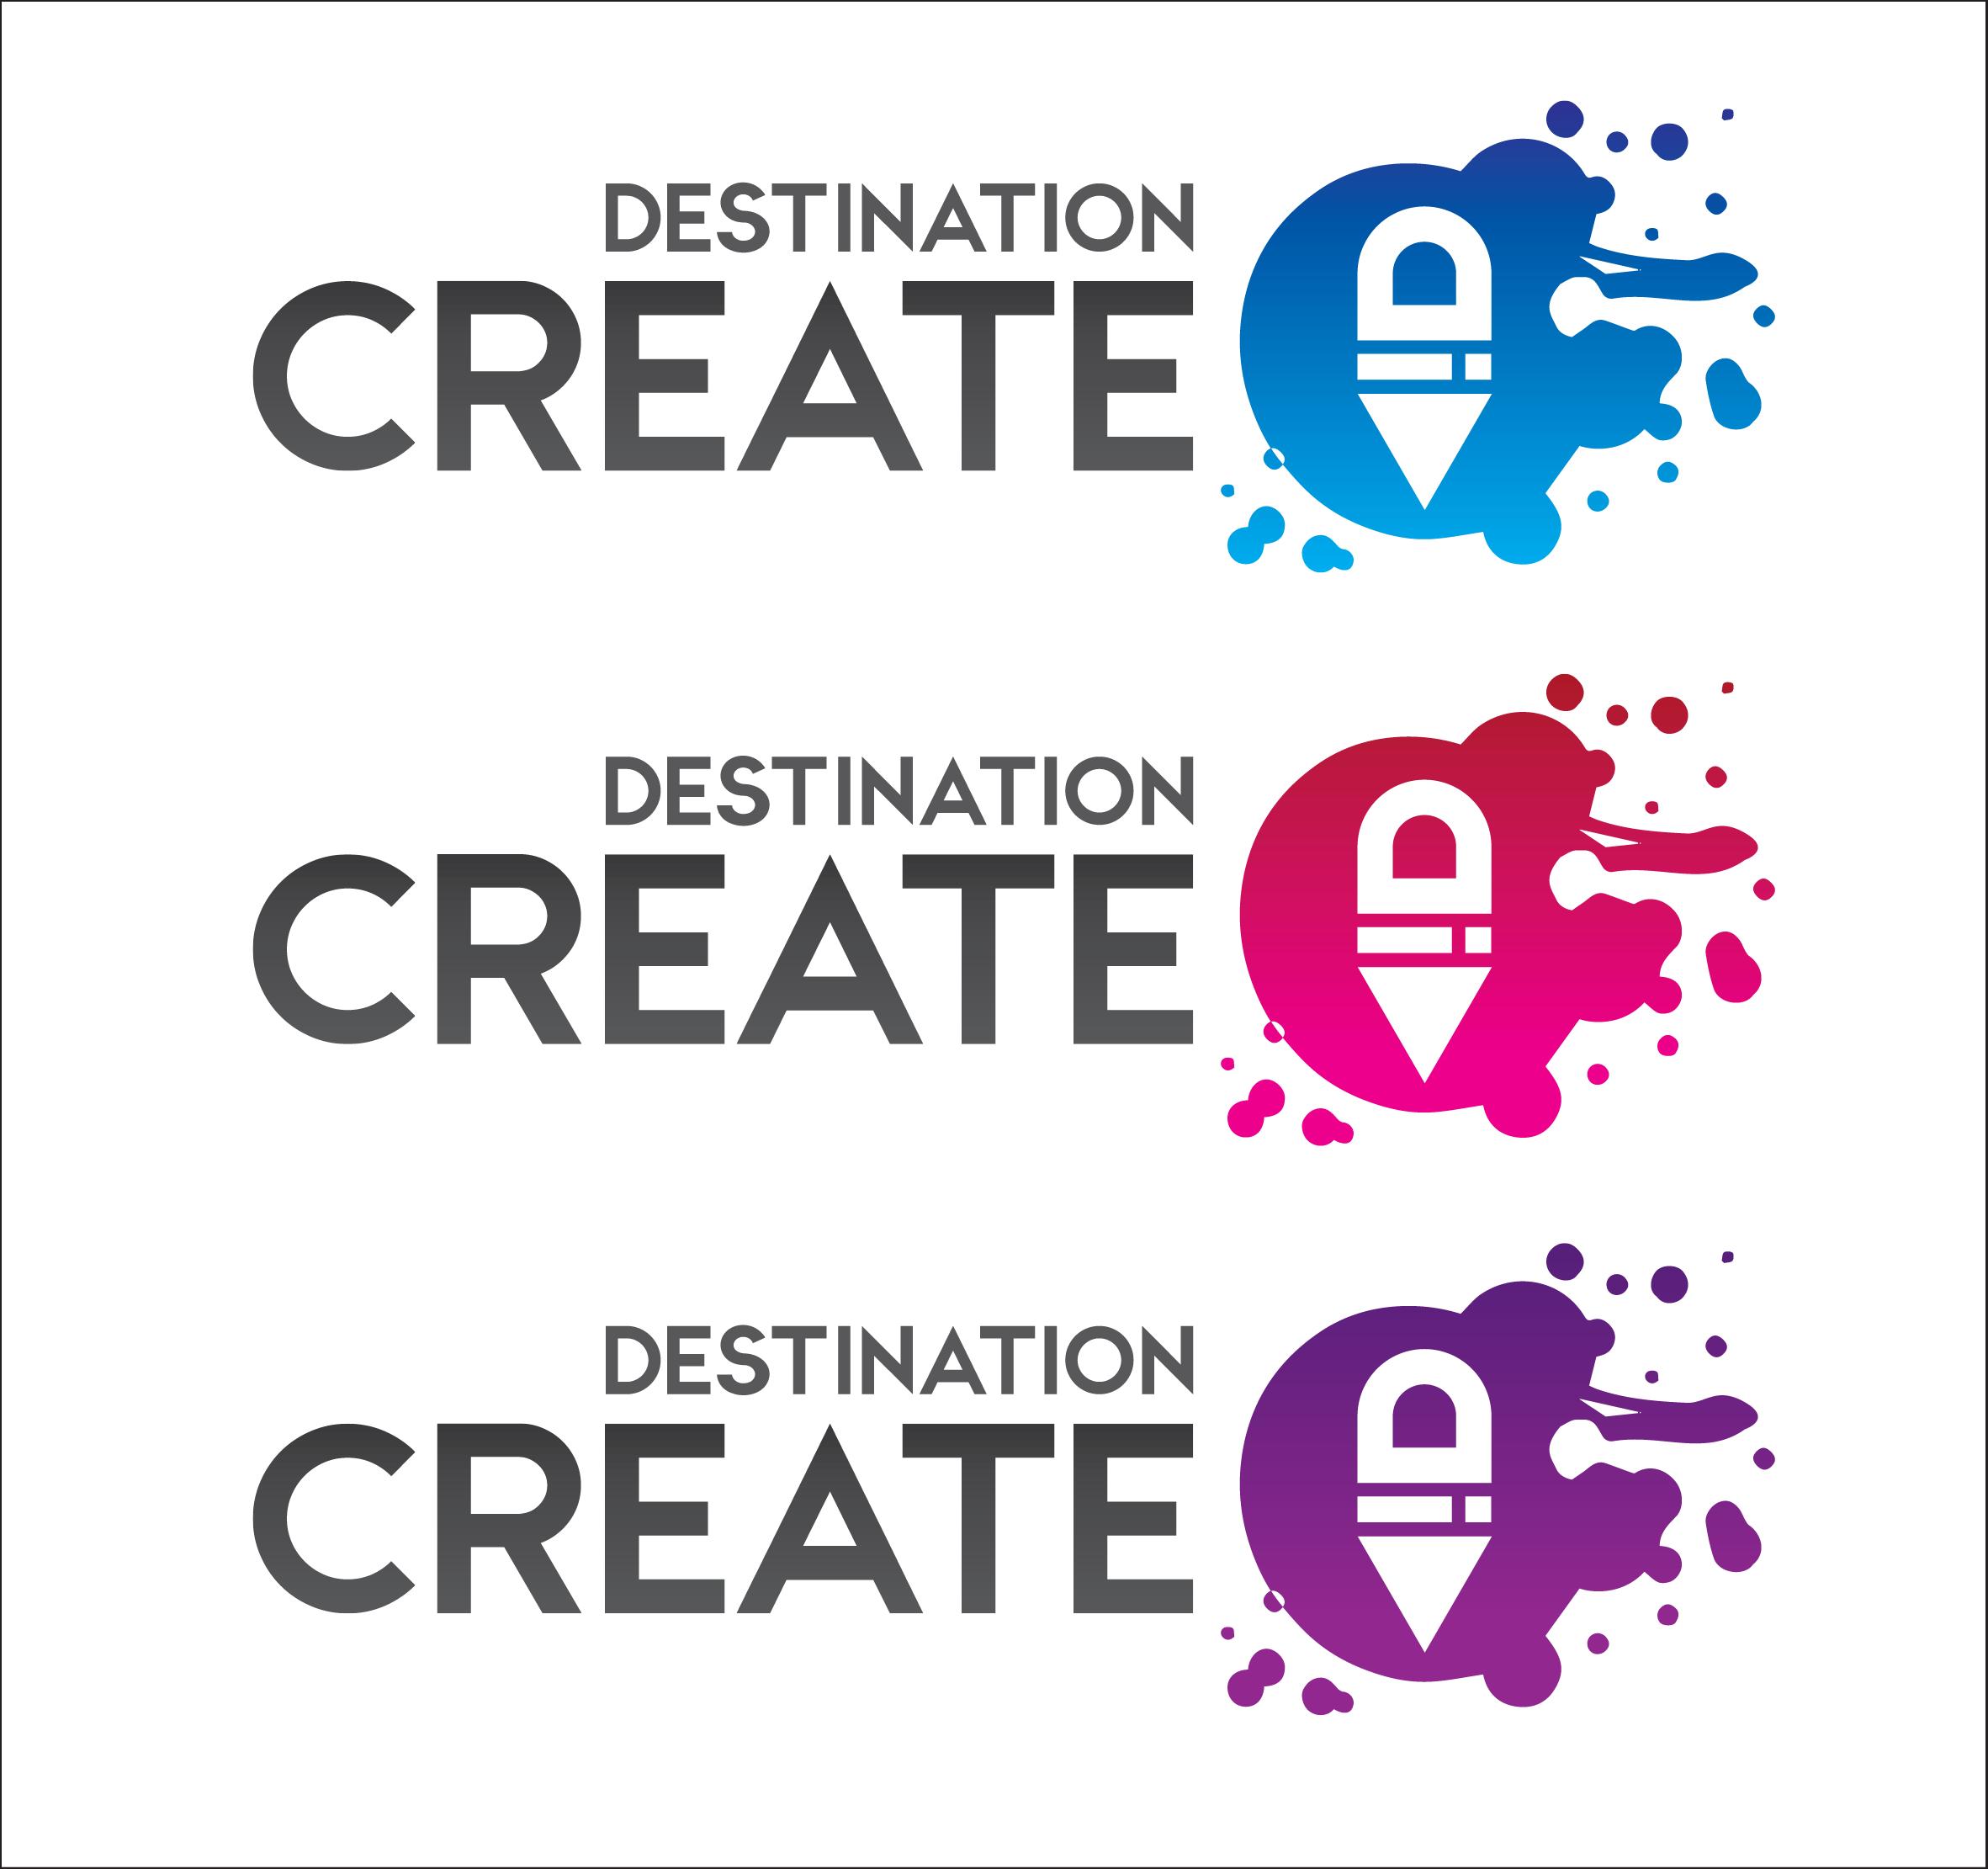 Destination Create logo variations